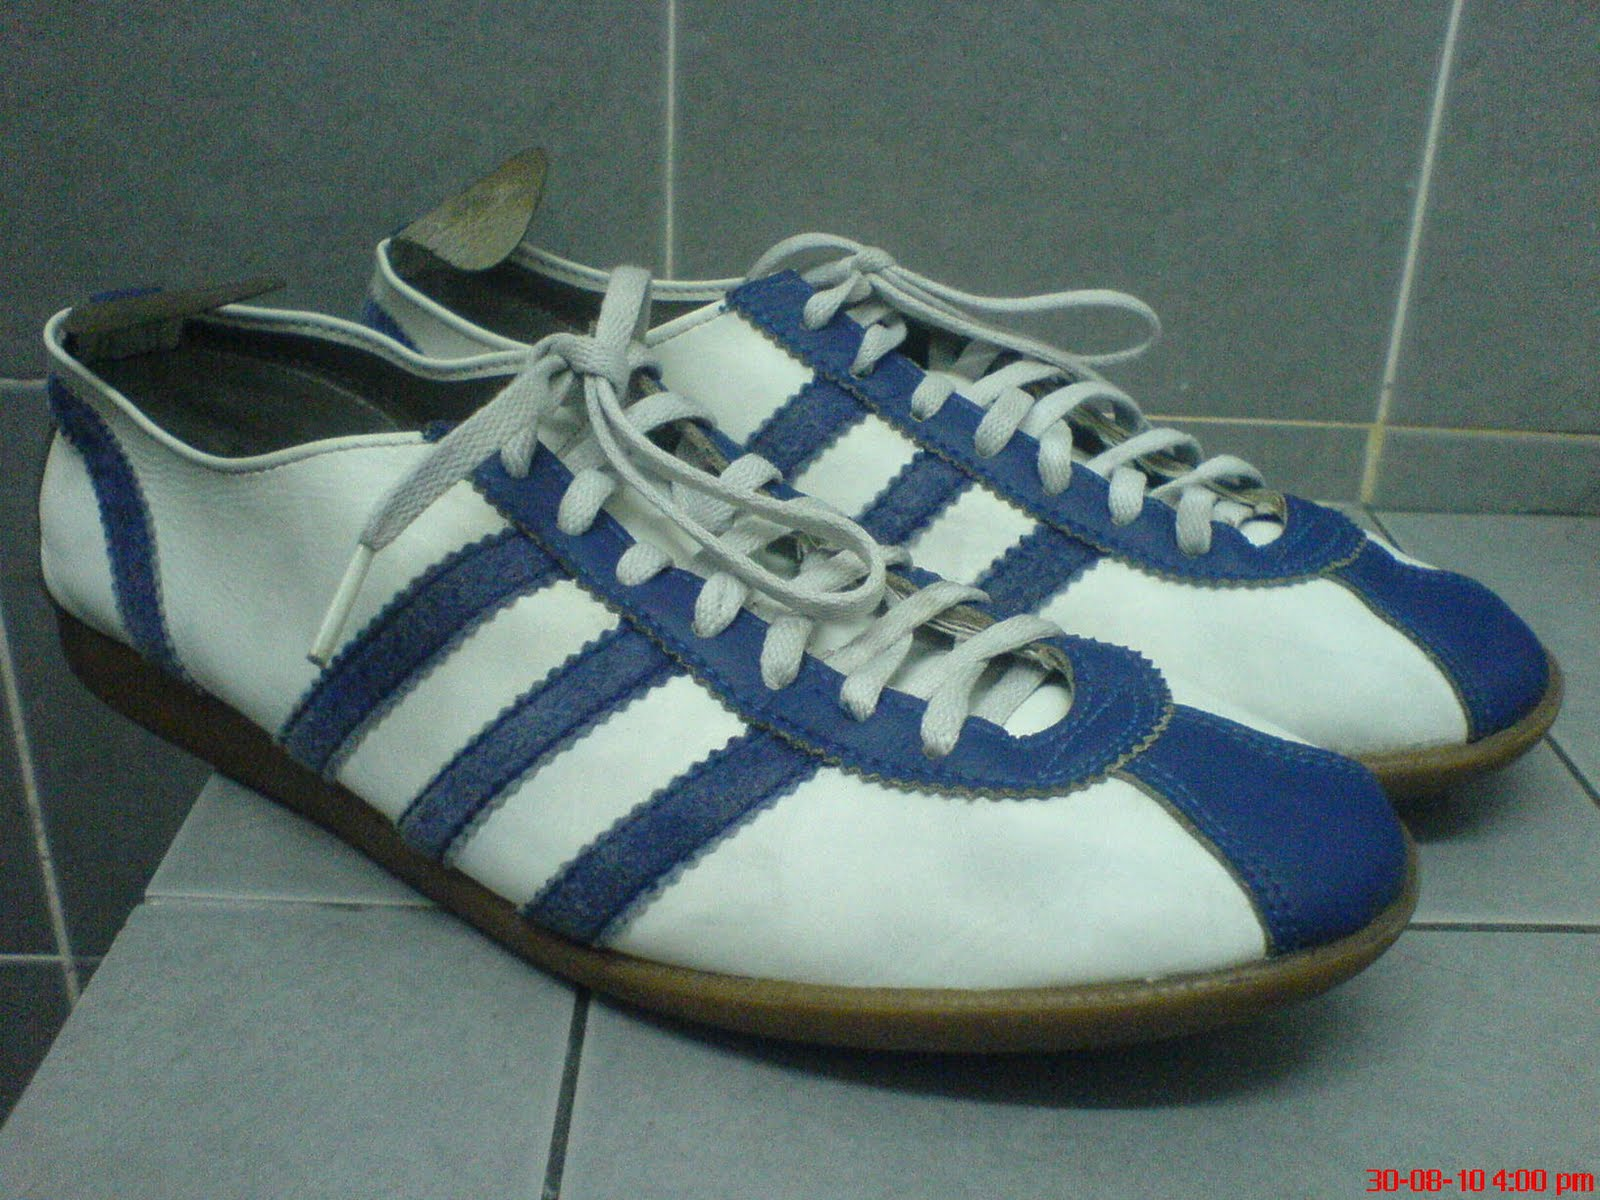 planet vintage vintage adidas saigon shoes 9 uk sold